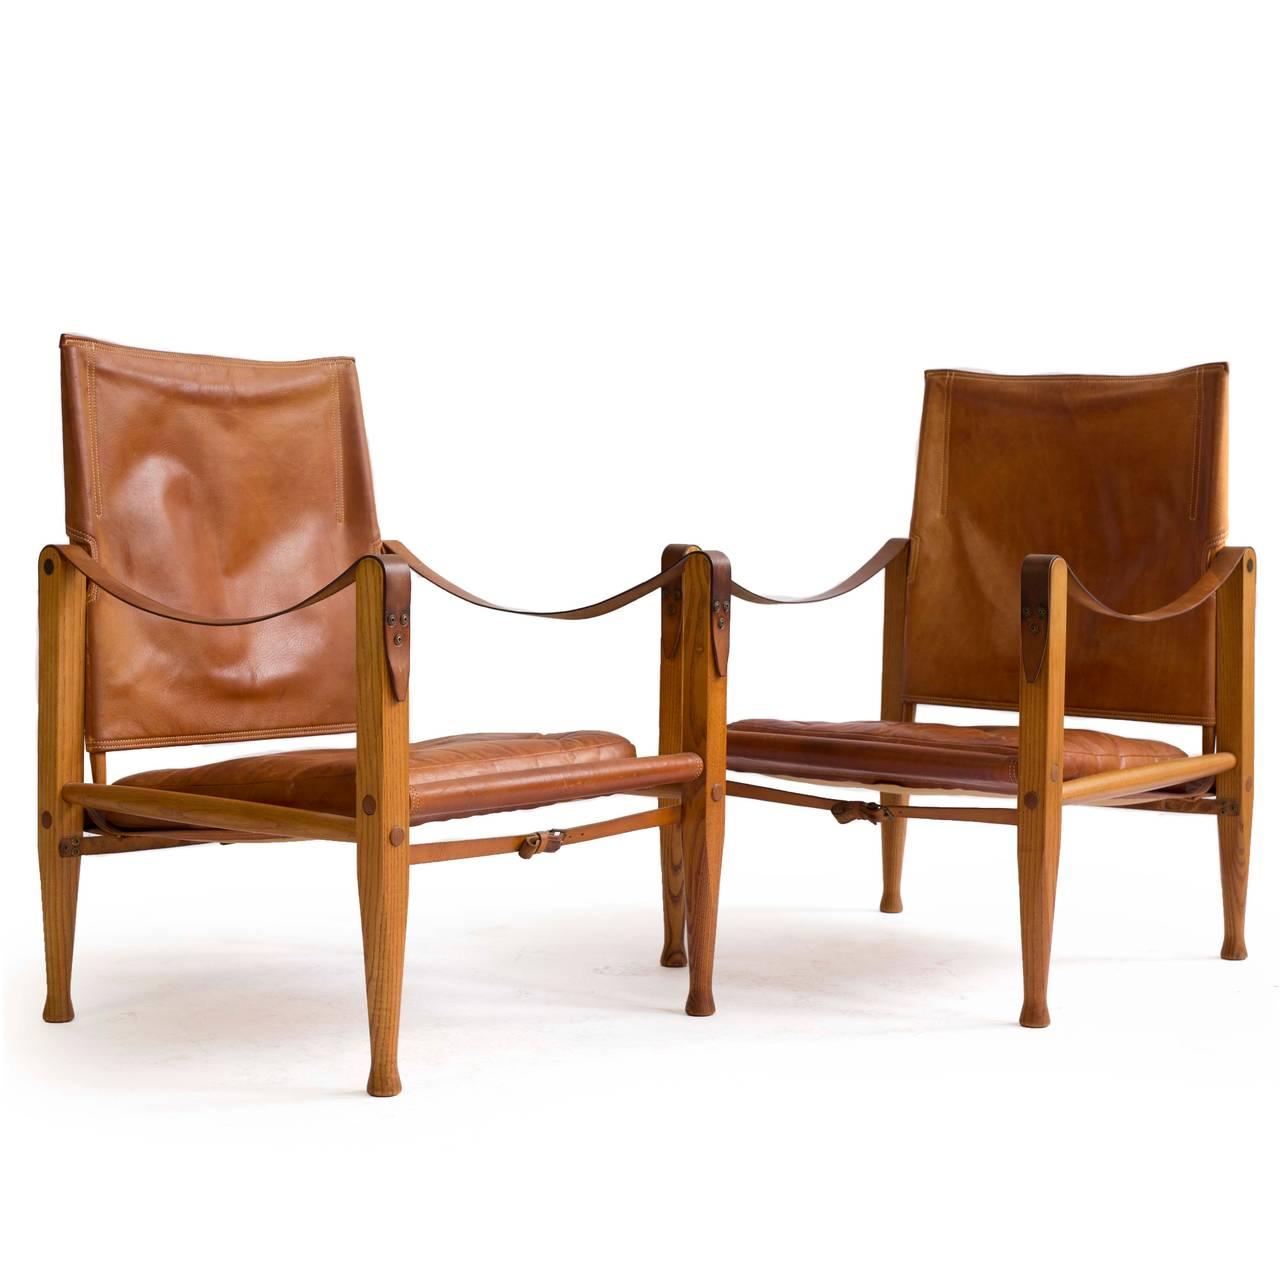 Mid-20th Century Kaare Klint Pair of 'Safari Chairs' for Rud. Rasmussen